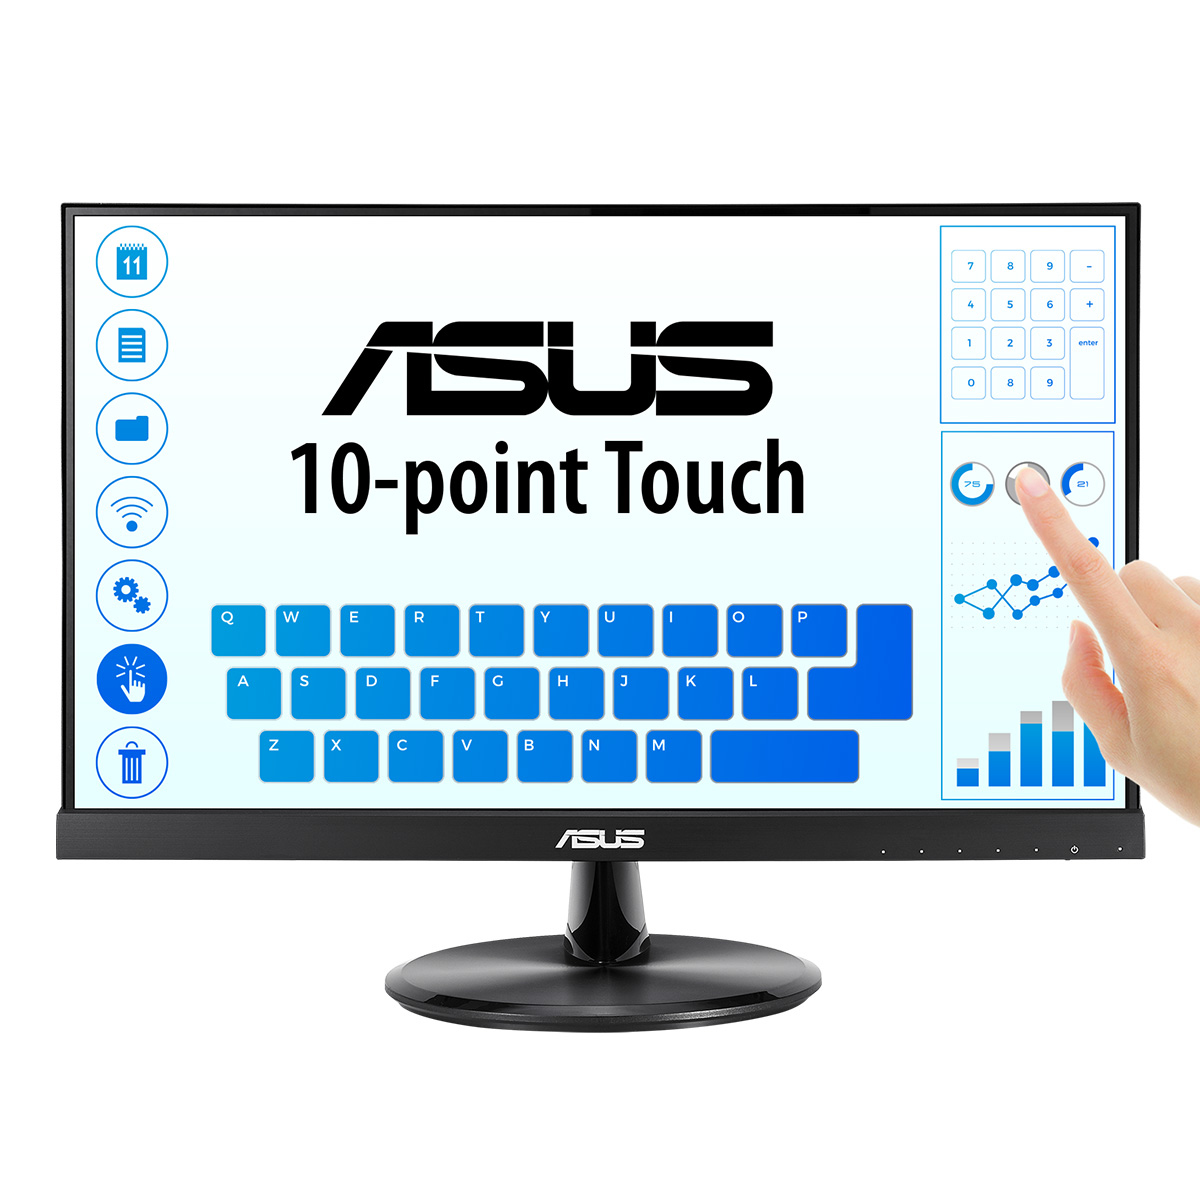 ASUS VT229H computer monitor 54.6 cm (21.5